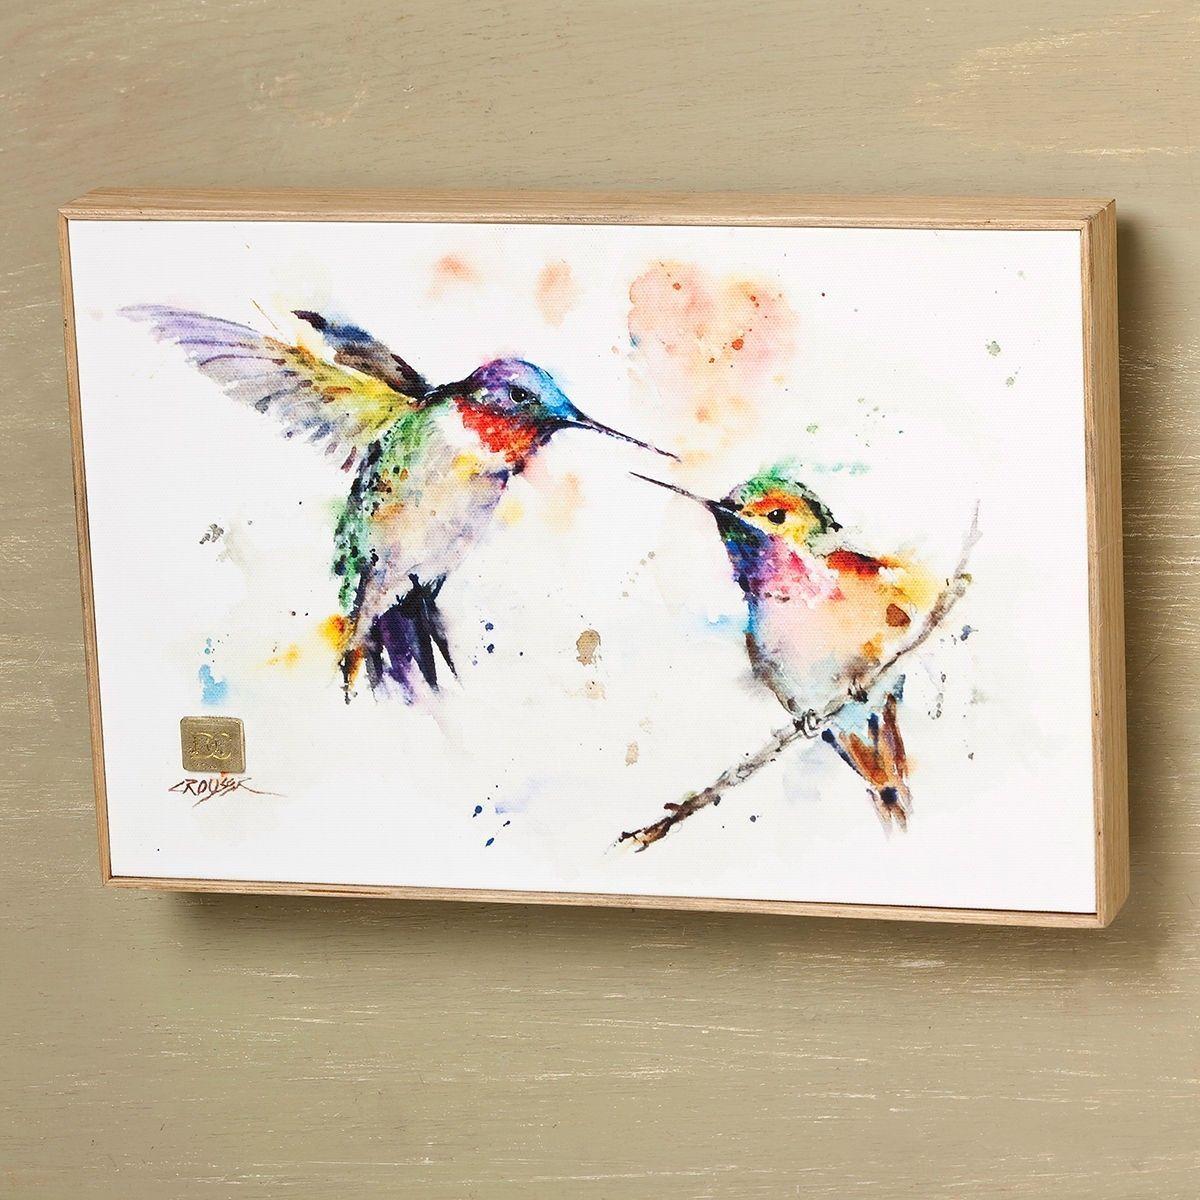 DEAN CROUSER Watercolor Print Framed Canvas Art Hummingbird B5050130 ...